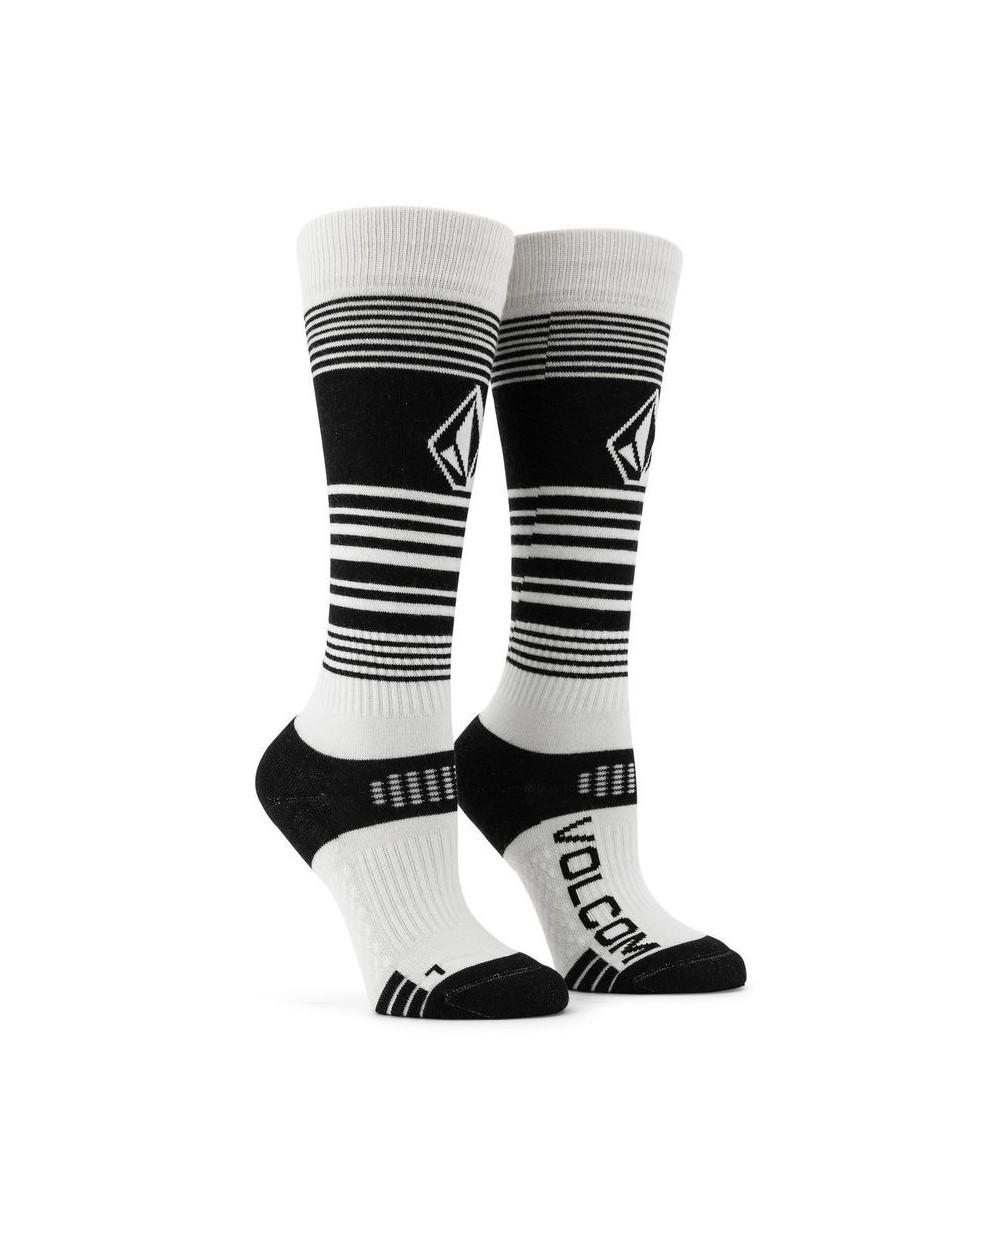 Volcom Tundra Tech Socks - Black